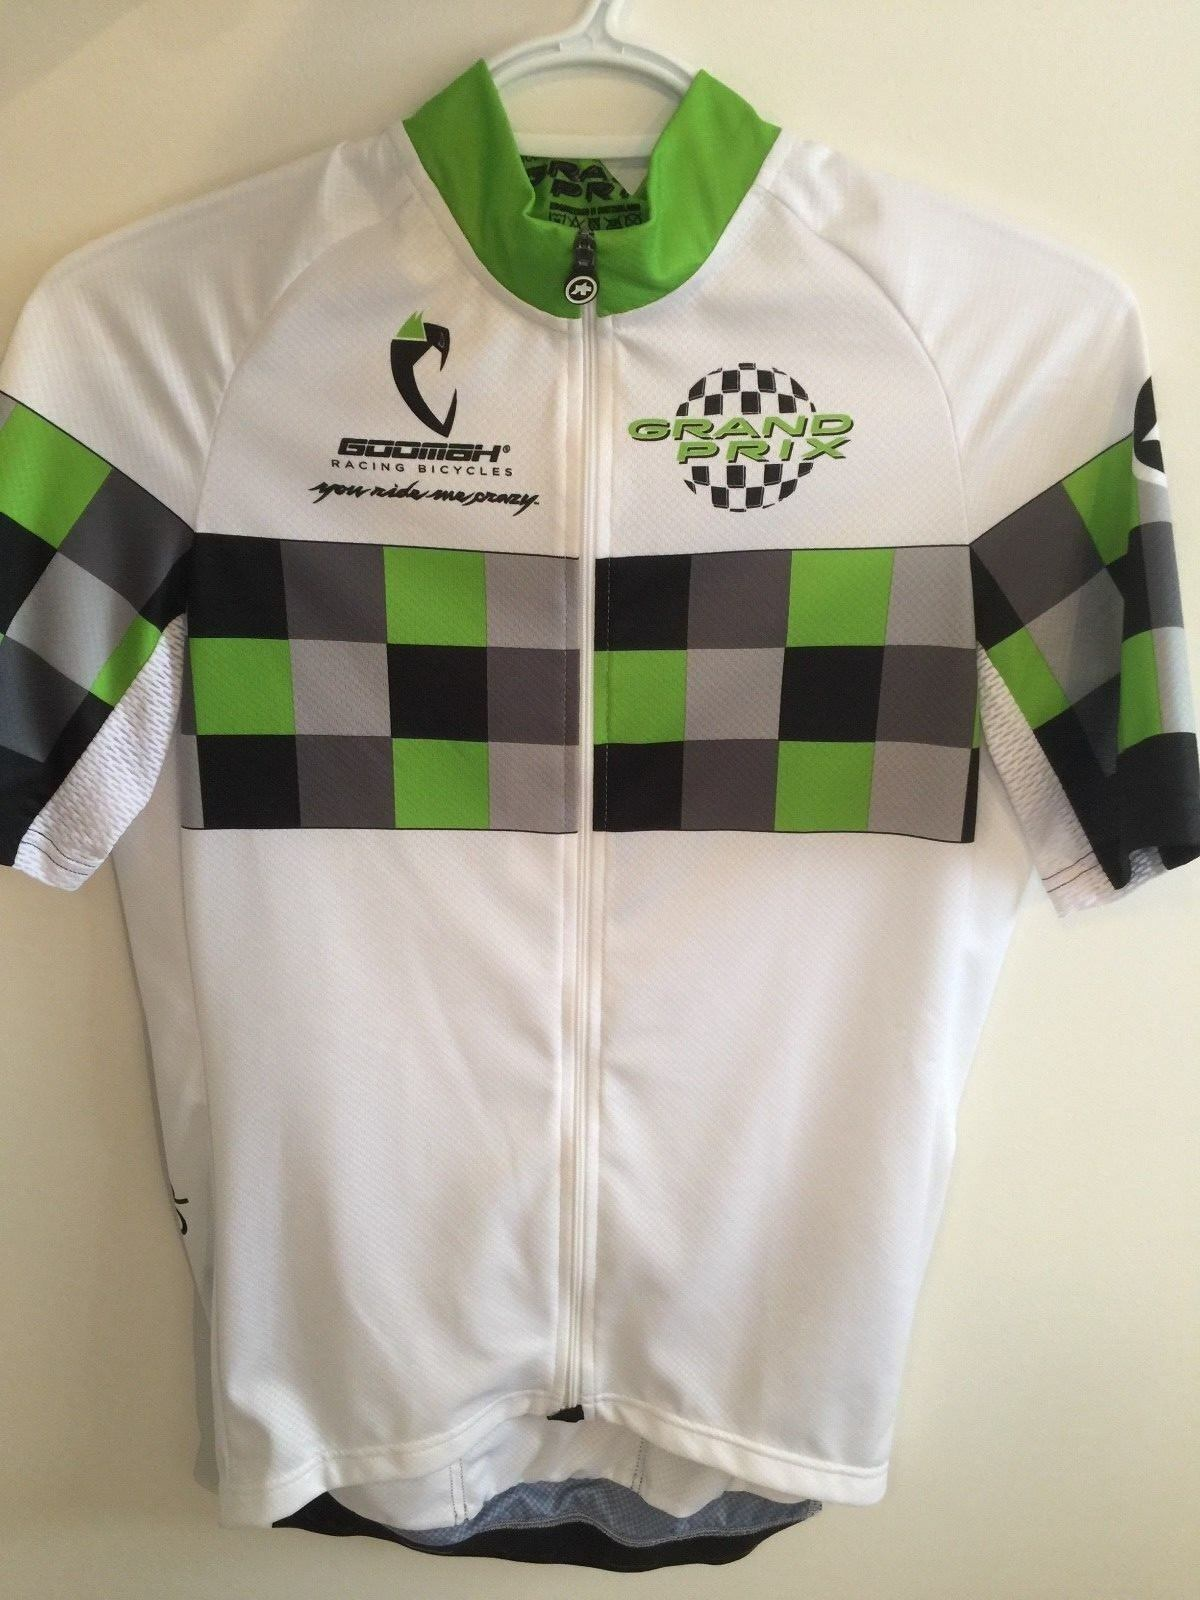 New ASSOS SS.GRANDPRIXJERSEY_EVO8 Cycling Cycling SS.GRANDPRIXJERSEY_EVO8 Jersey Größe Medium e7fd6e